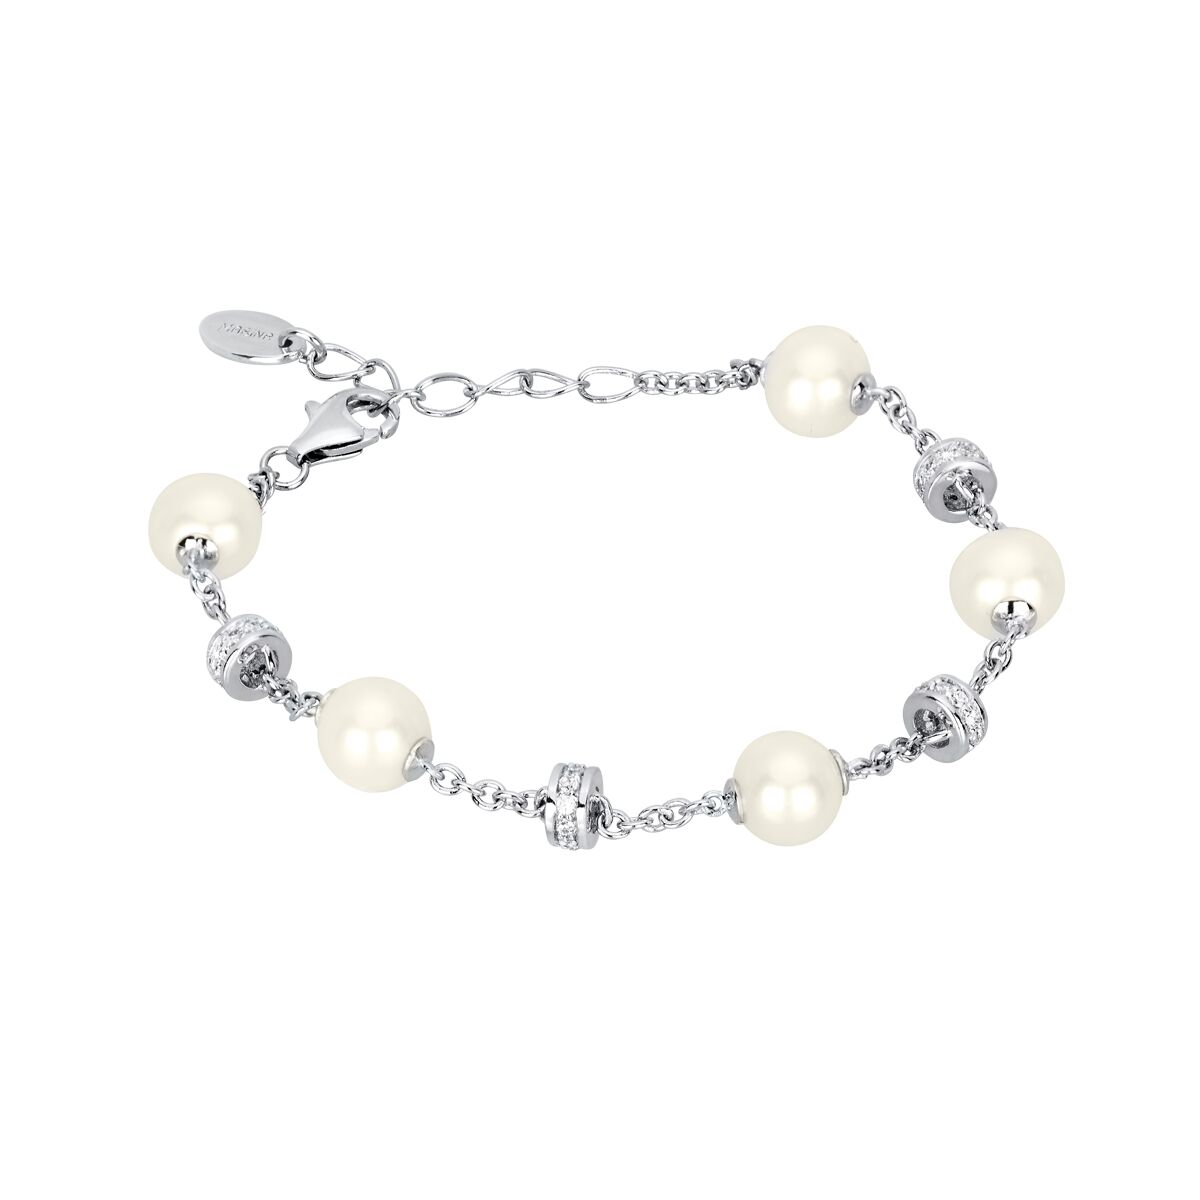 Mabina Gioielli Armband mit Zuchtperle und Zirkonia 533135 NEU